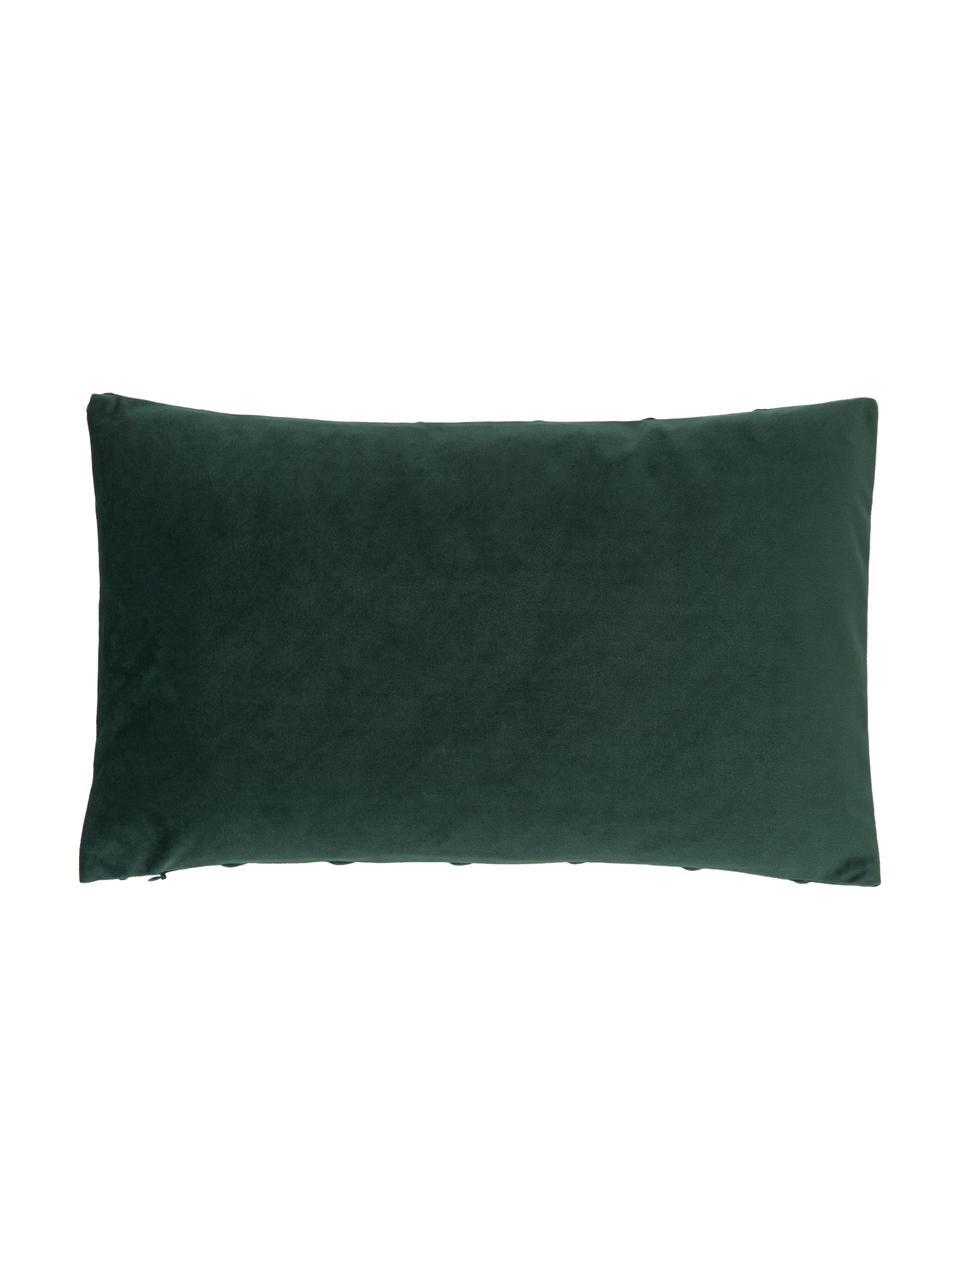 Samt-Kissenhülle Leyla in Dunkelgrün mit Struktumuster, Samt (100% Polyester), Grün, 30 x 50 cm